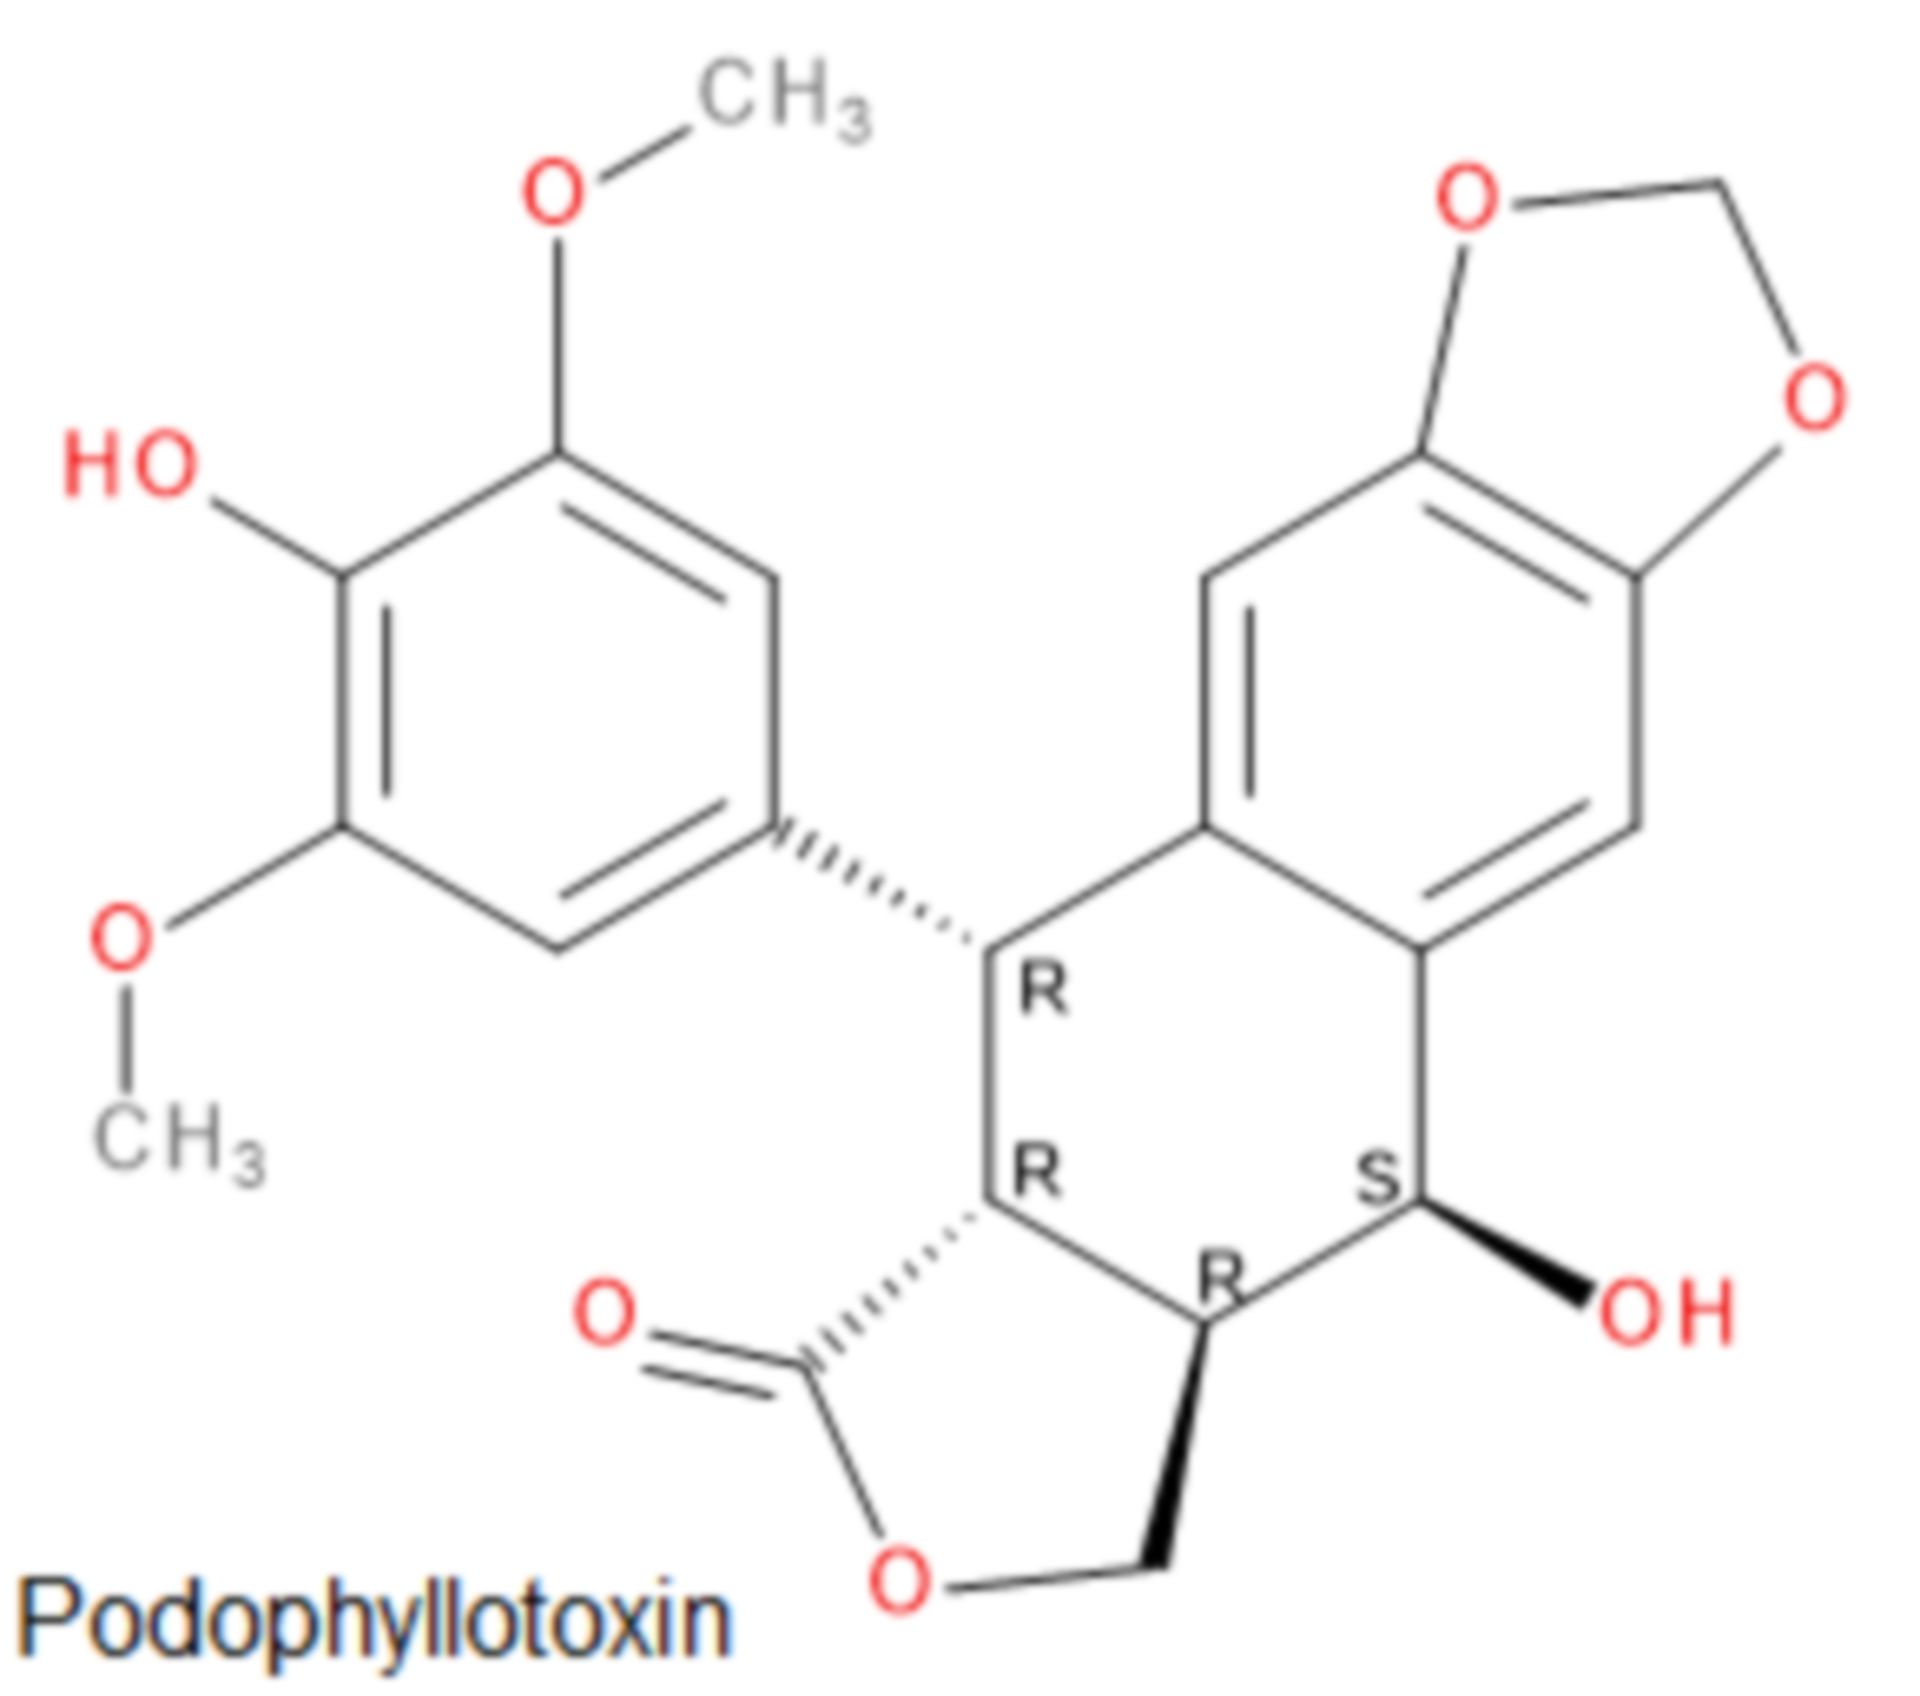 Podophyllotoxin